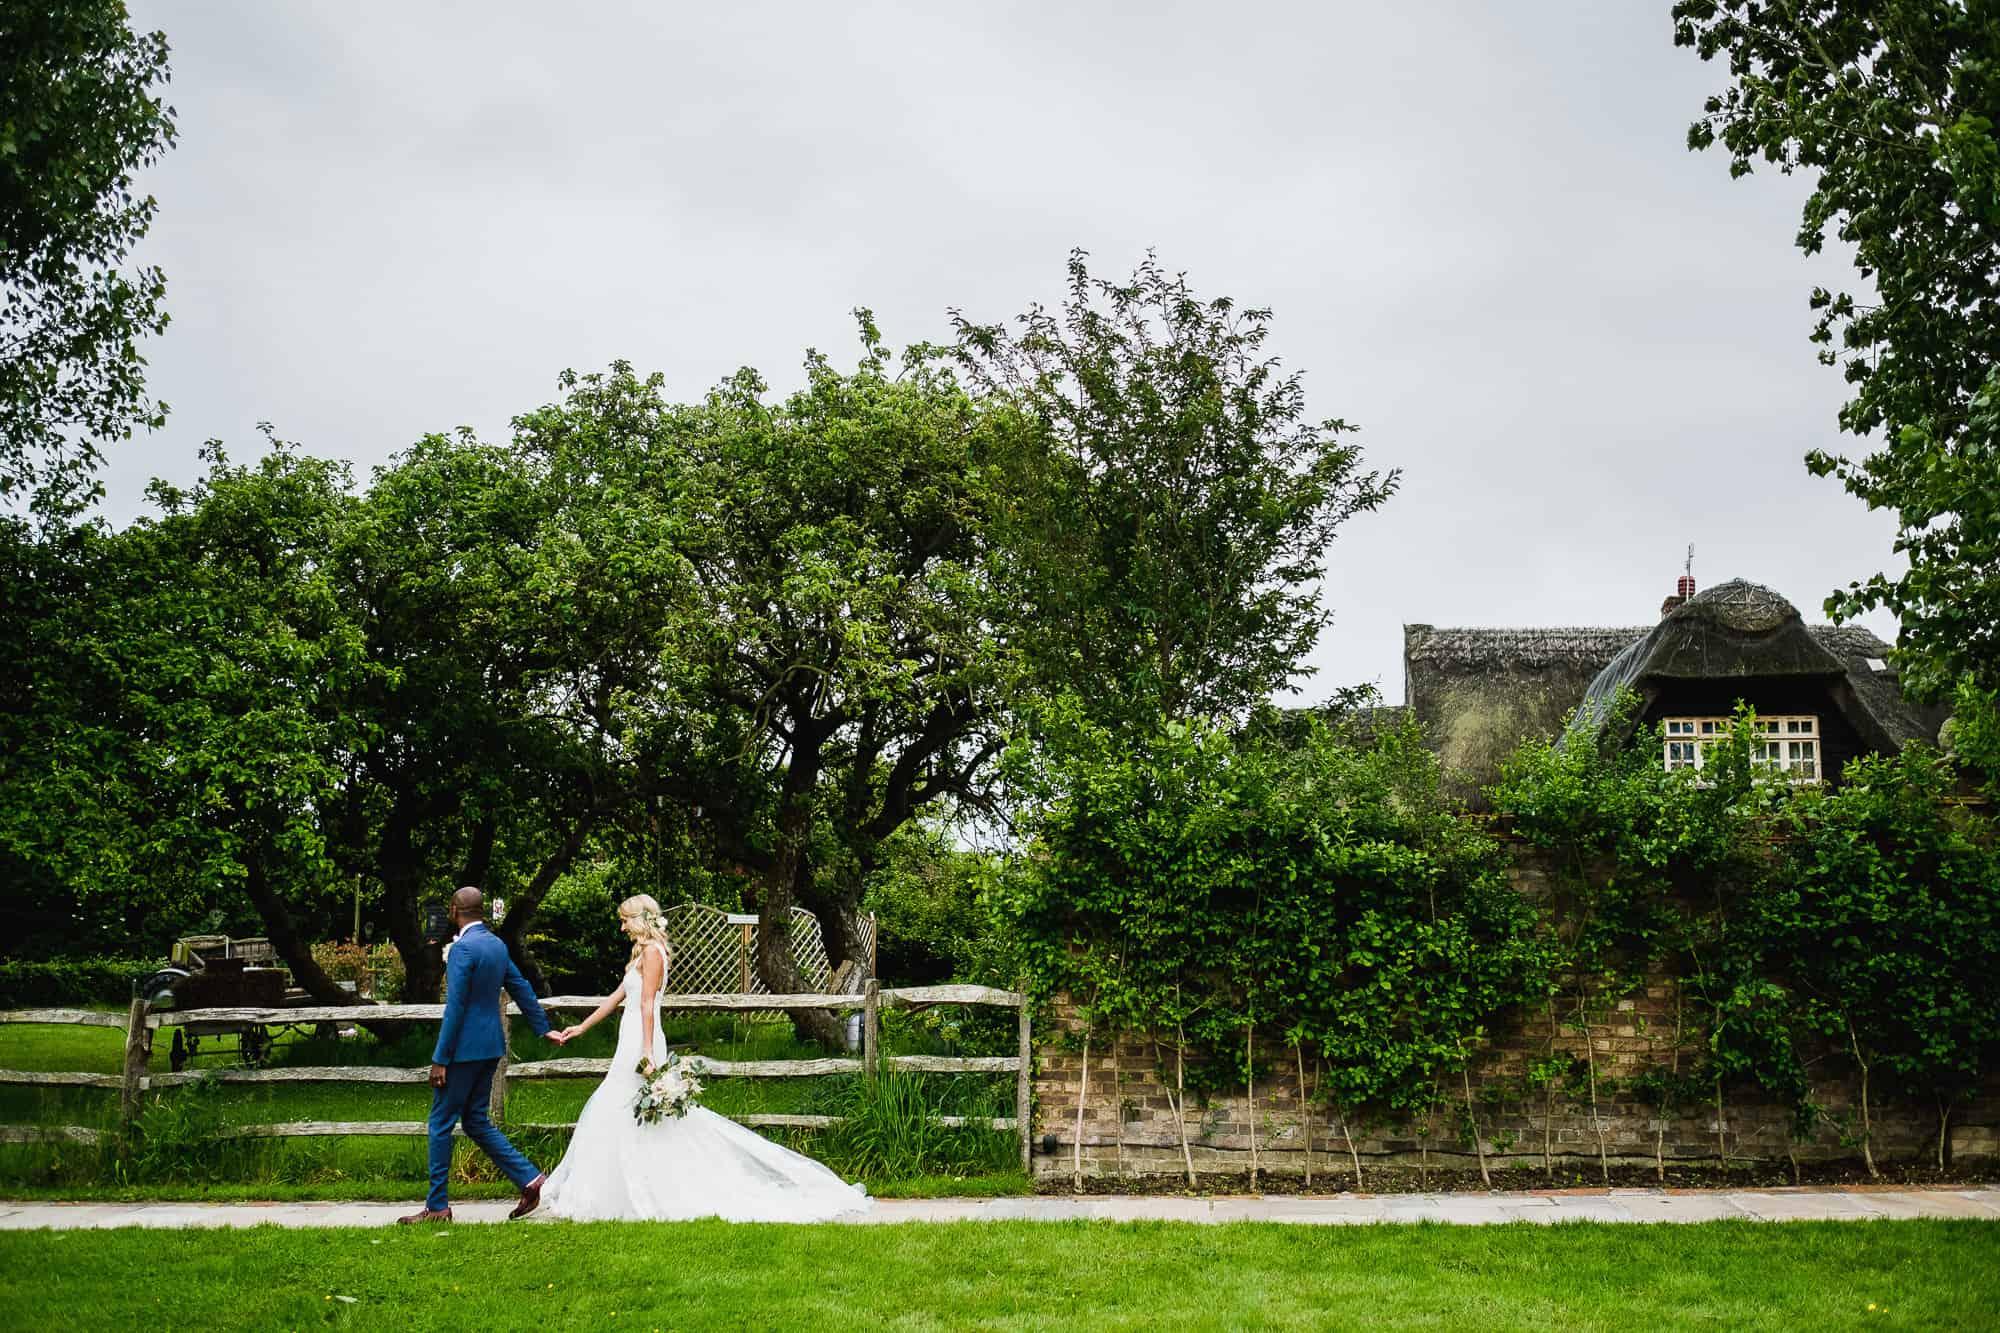 marleybrook-house-wedding-photography-matt-tyler-0042